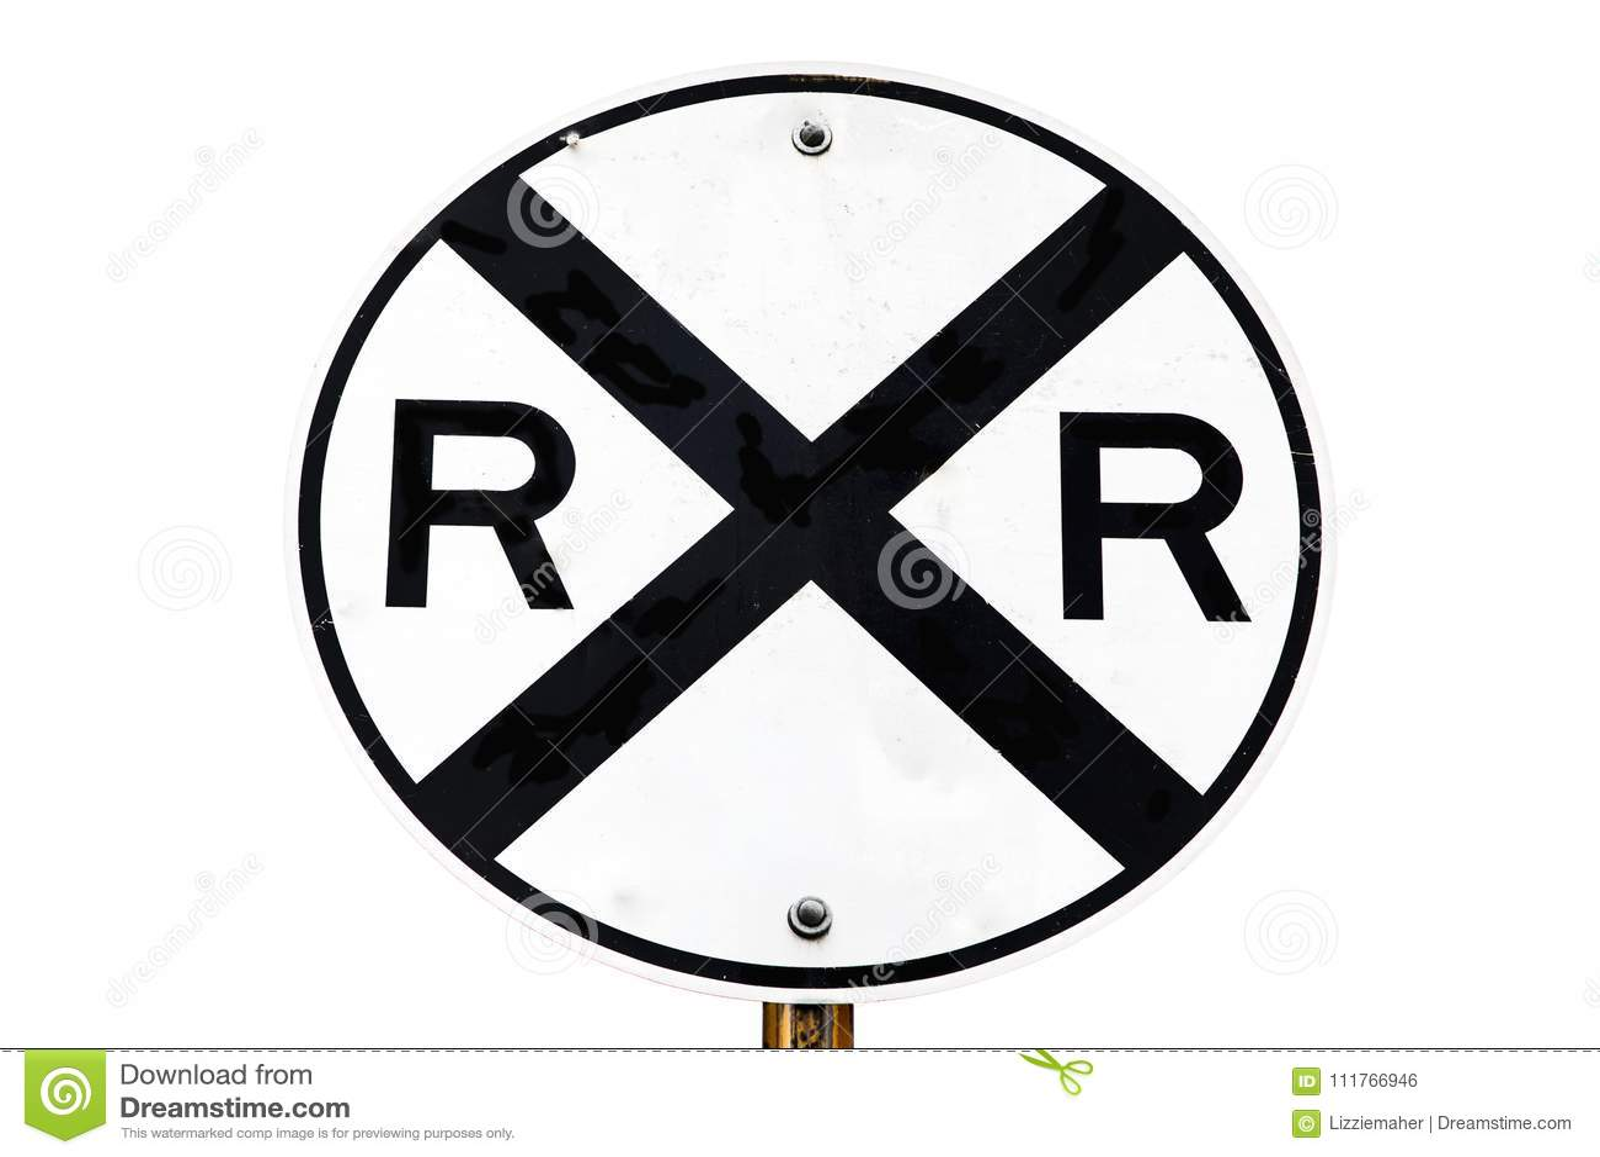 Sinal do cruzamento de estrada de ferro